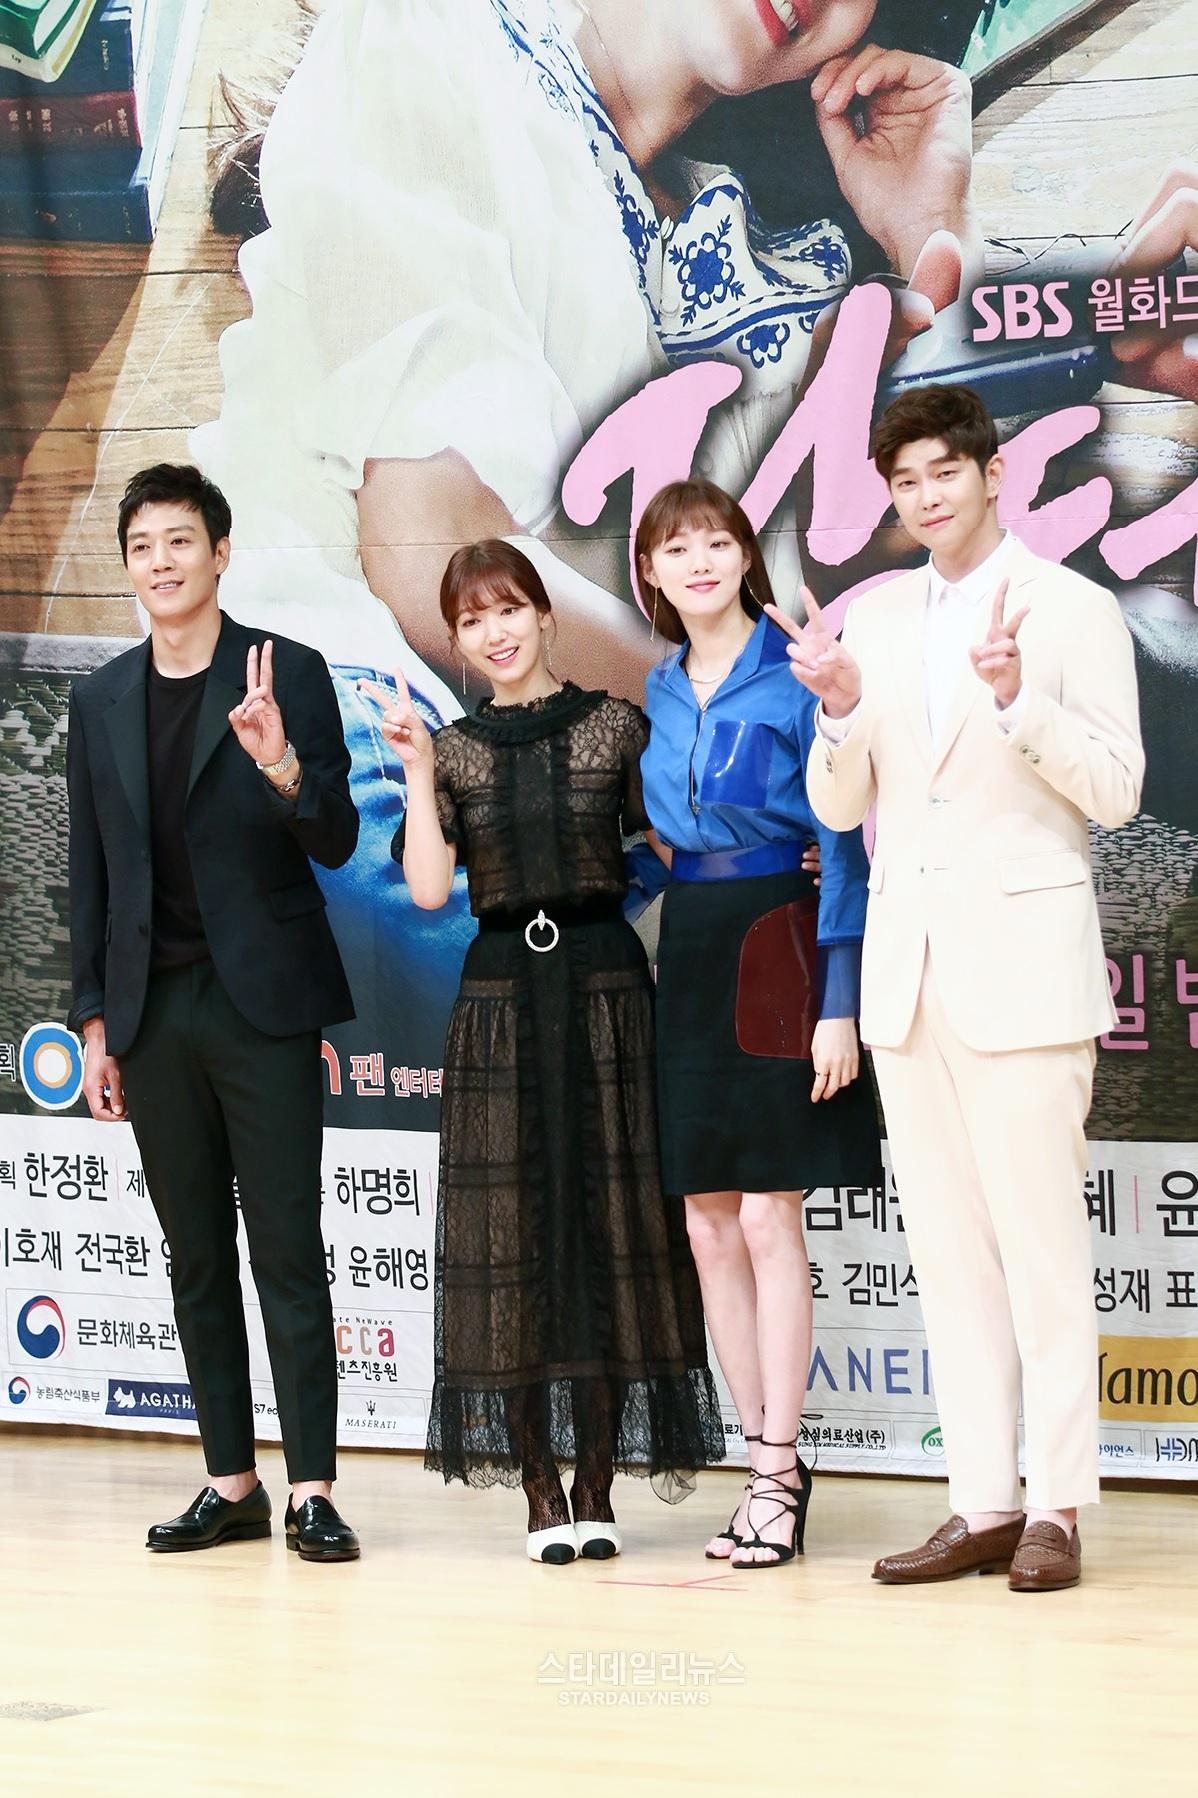 kim rae won park shin hye lee sung kyung yoon kyung sang